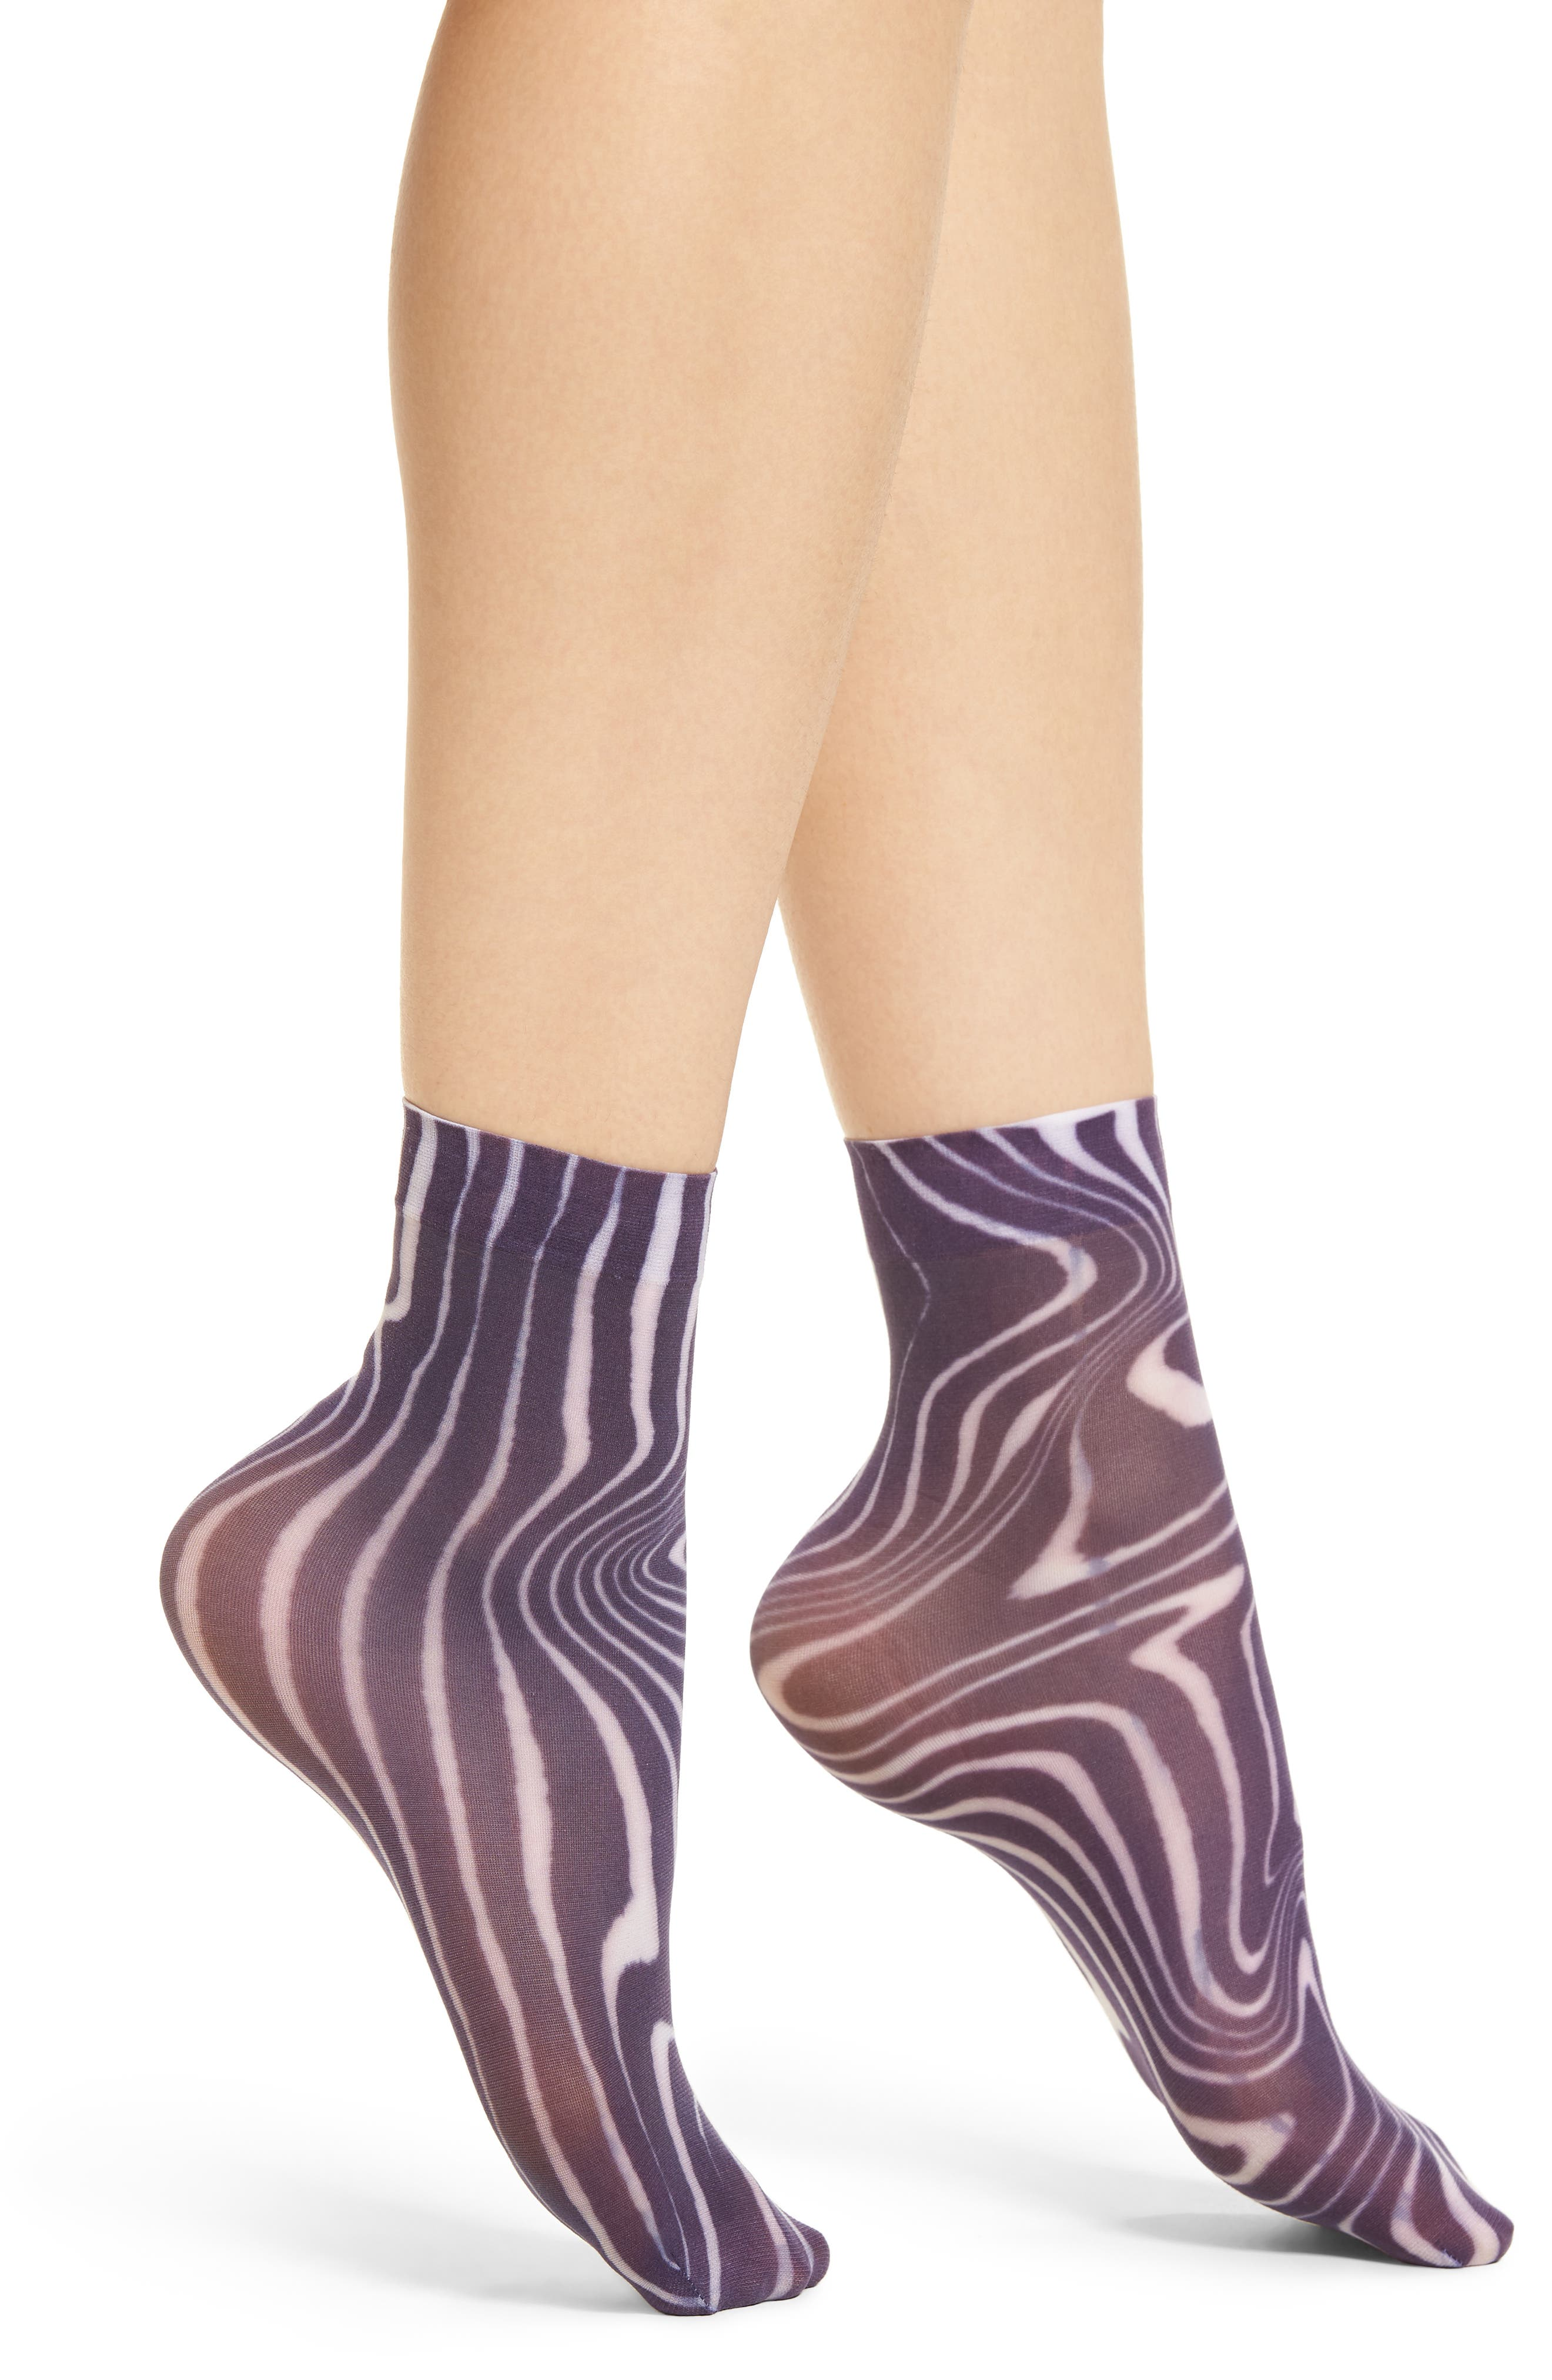 Mia Ankle Socks,                         Main,                         color, 009